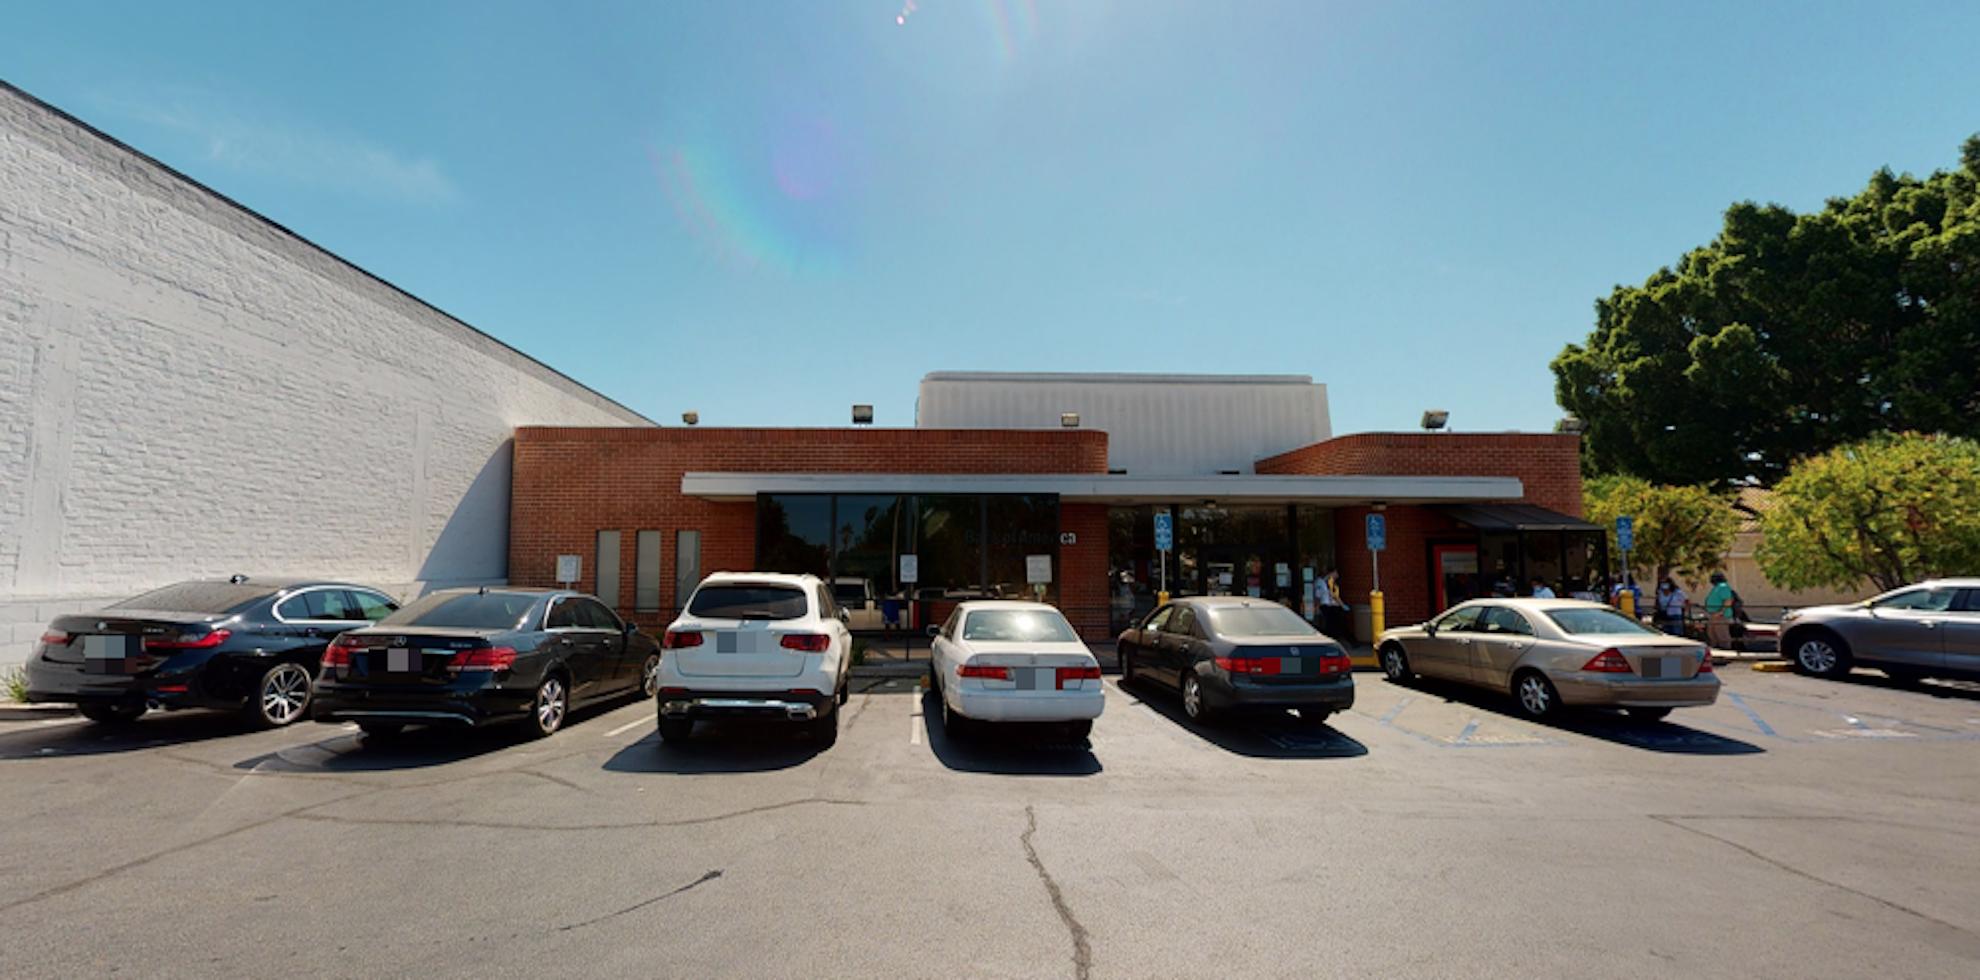 Bank of America financial center with walk-up ATM   929 Fair Oaks Ave, South Pasadena, CA 91030